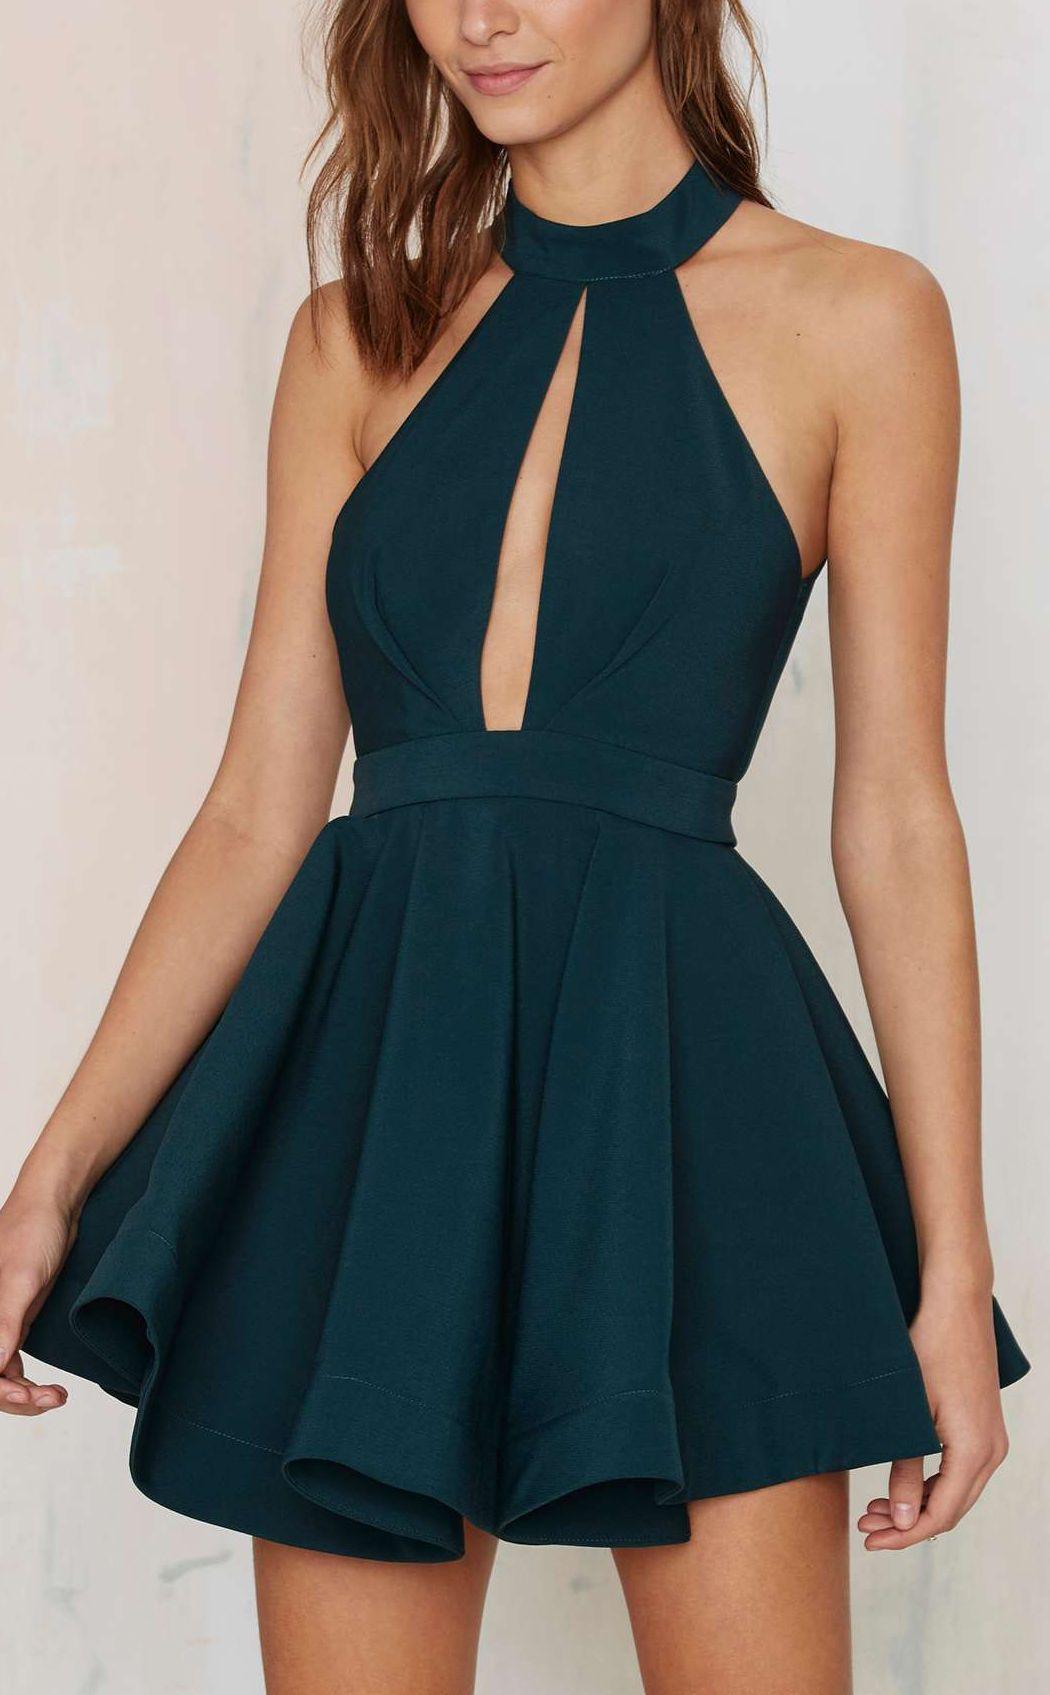 88dc624faca Emerald party dress